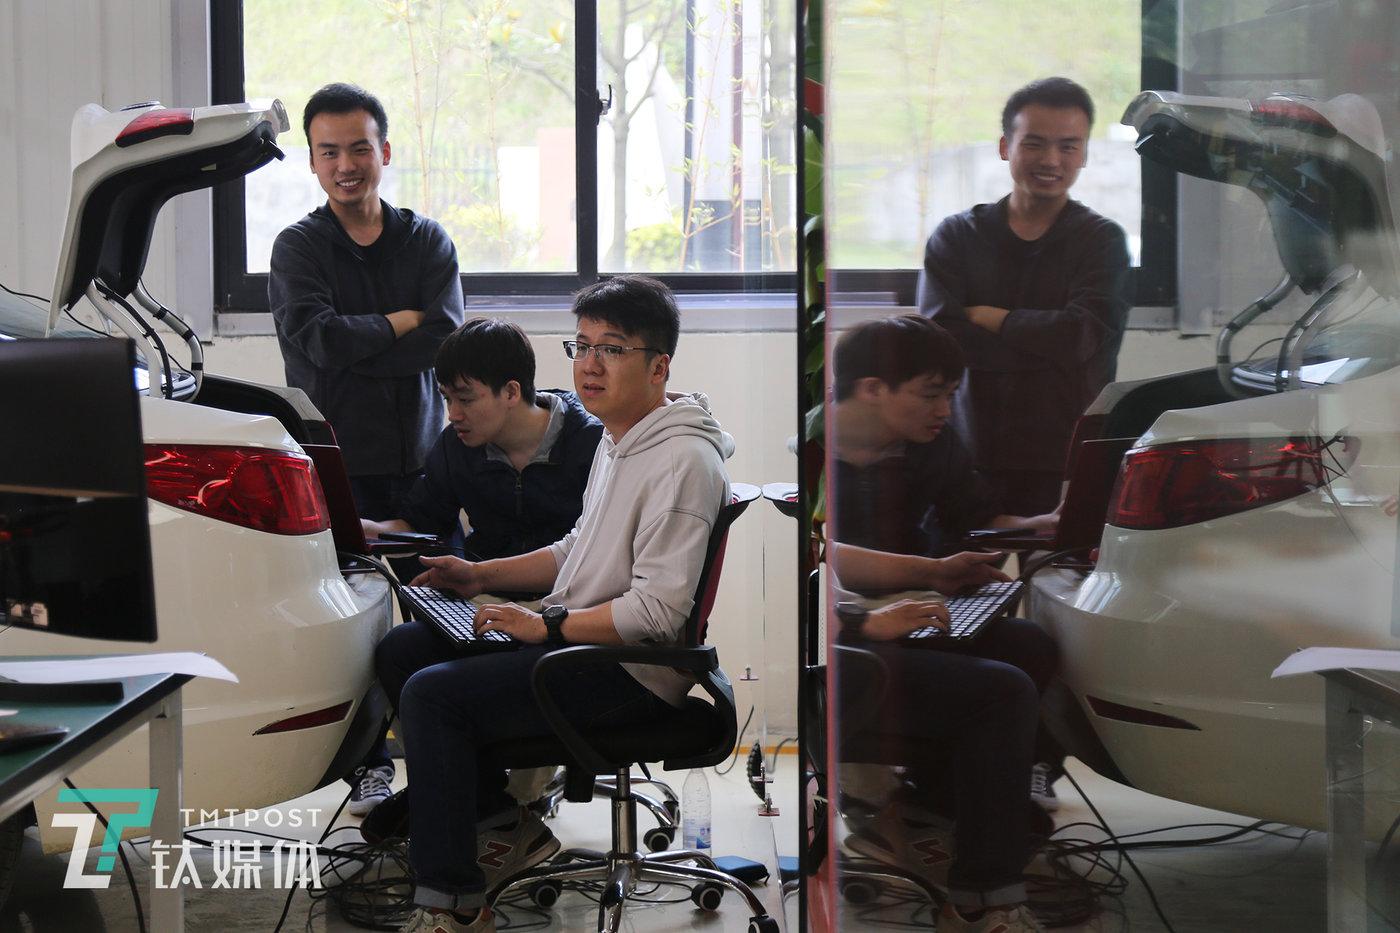 D队队员戚靓亮(图右)在修改路点参数。D队根据车在实际中行驶中的不同任务阶段,调试不同的速度、对不同的路点数量以及疏密程度进行修正。  戚靓亮是,中国移动浙江公司AI算法工程师,这次比赛中主要负责算法深度学习与图像处理。